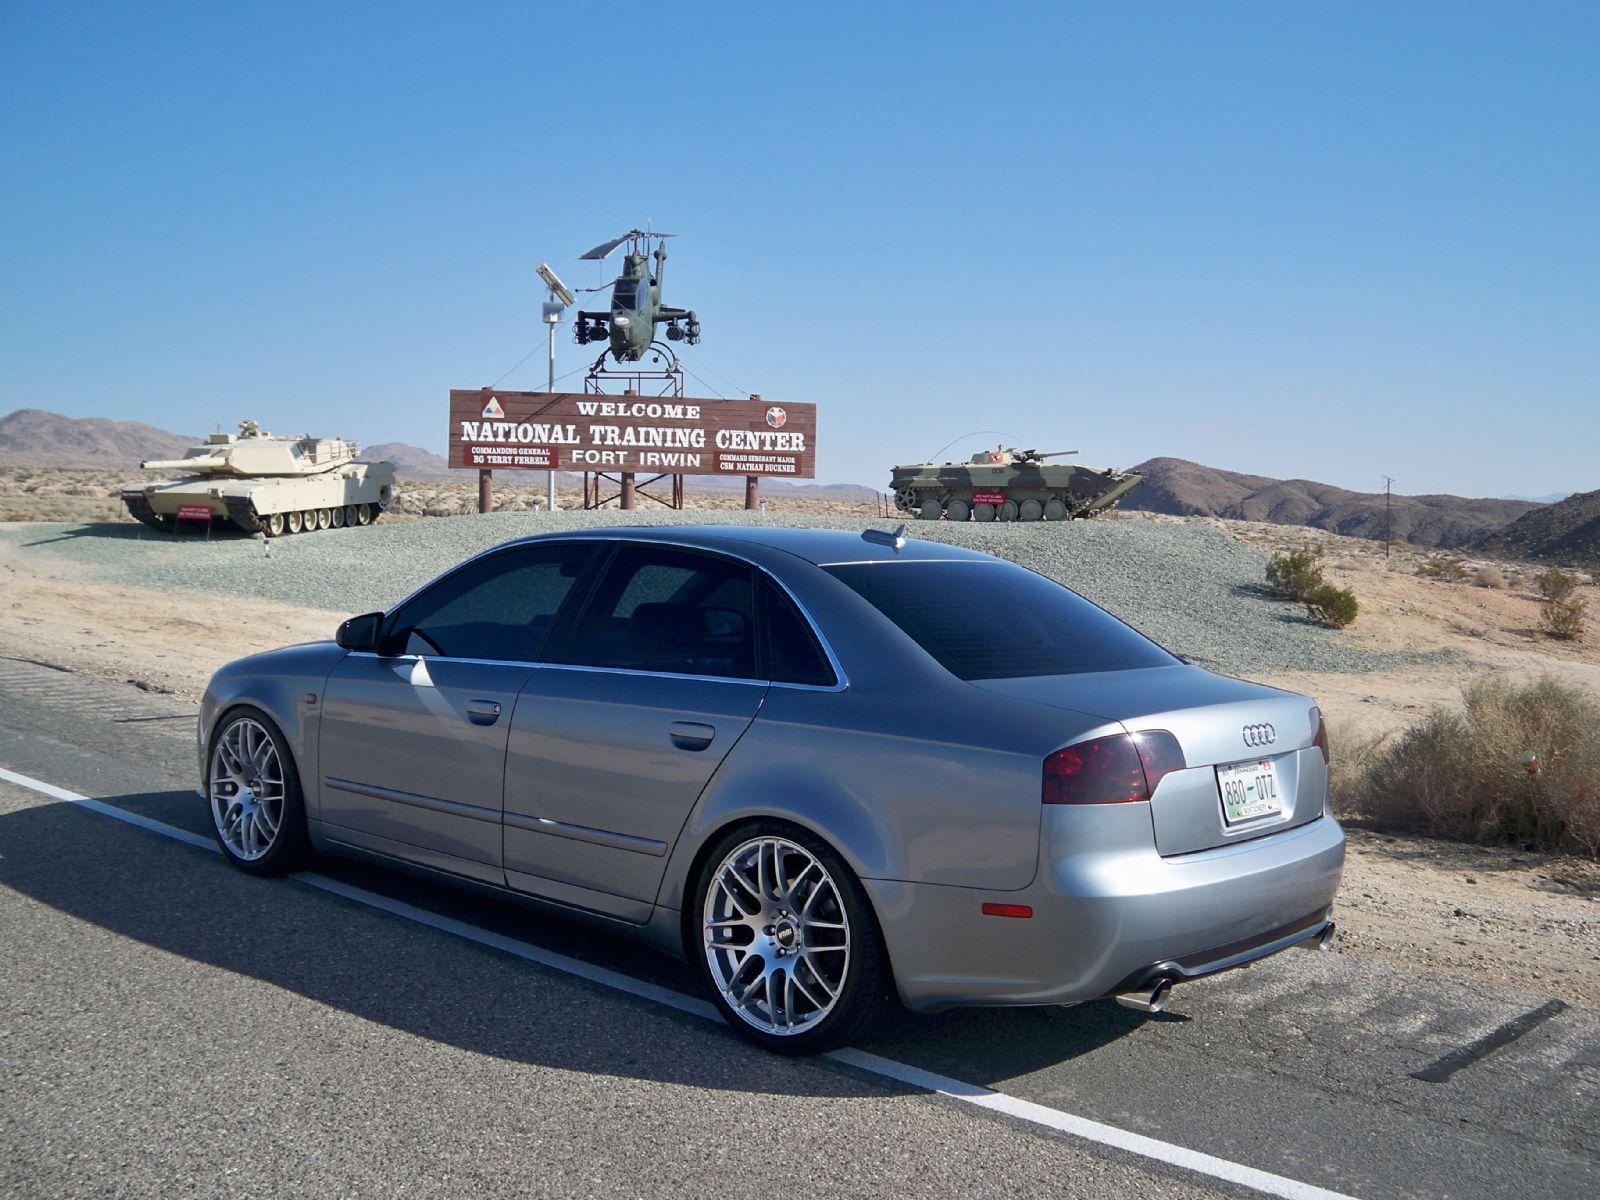 2006 Audi A4 Image 9